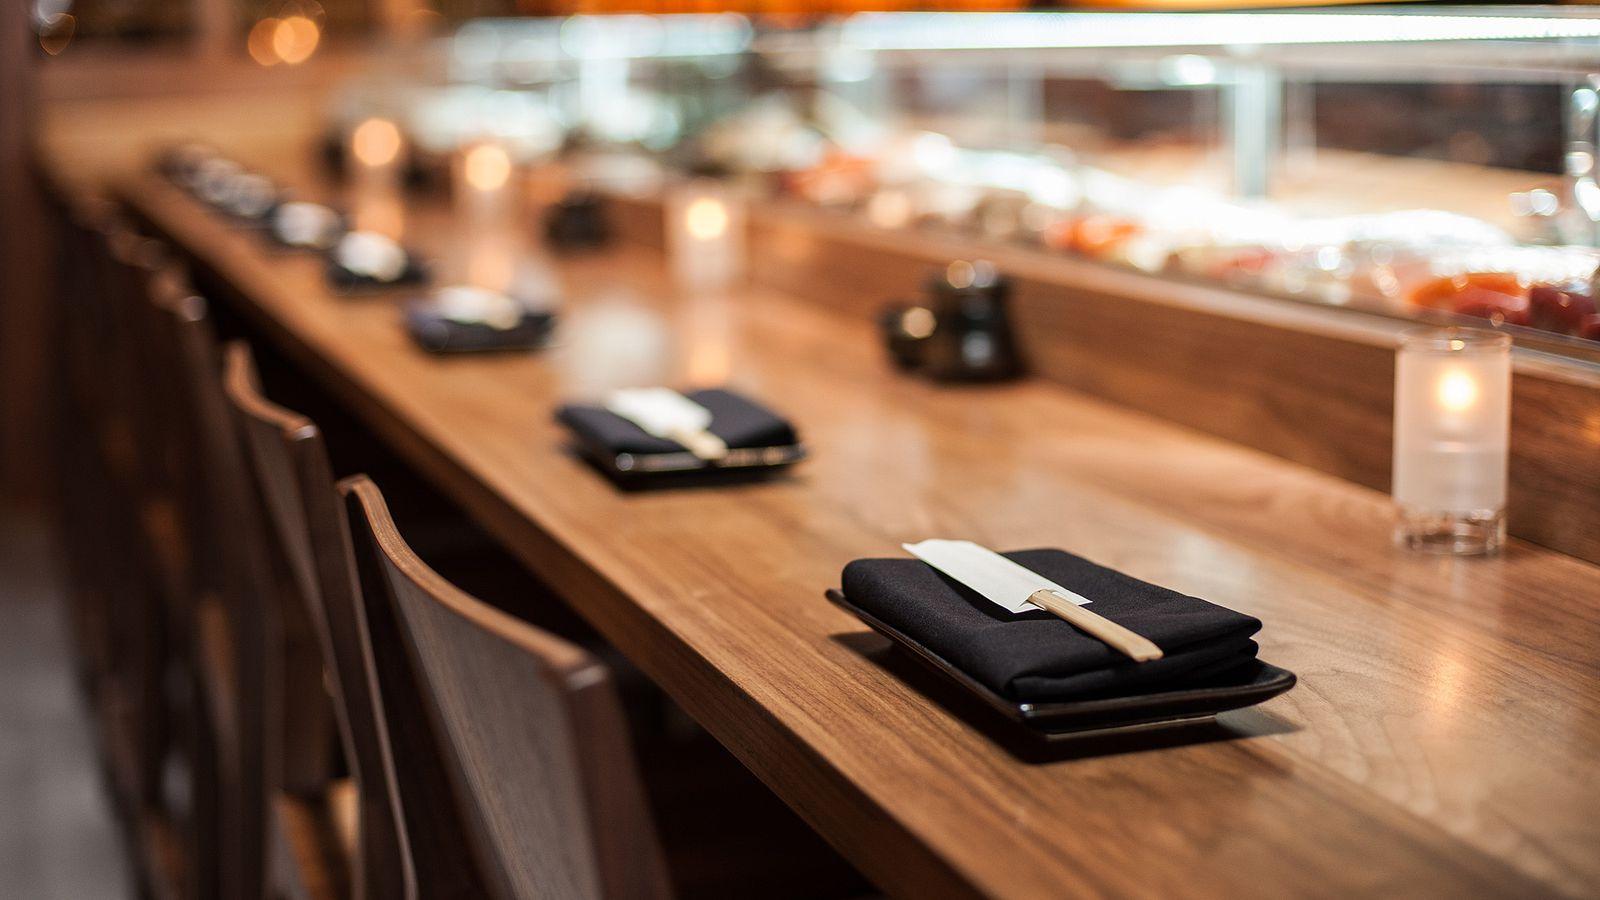 The essential los angeles sushi restaurants eater la for Wholesale fish market los angeles